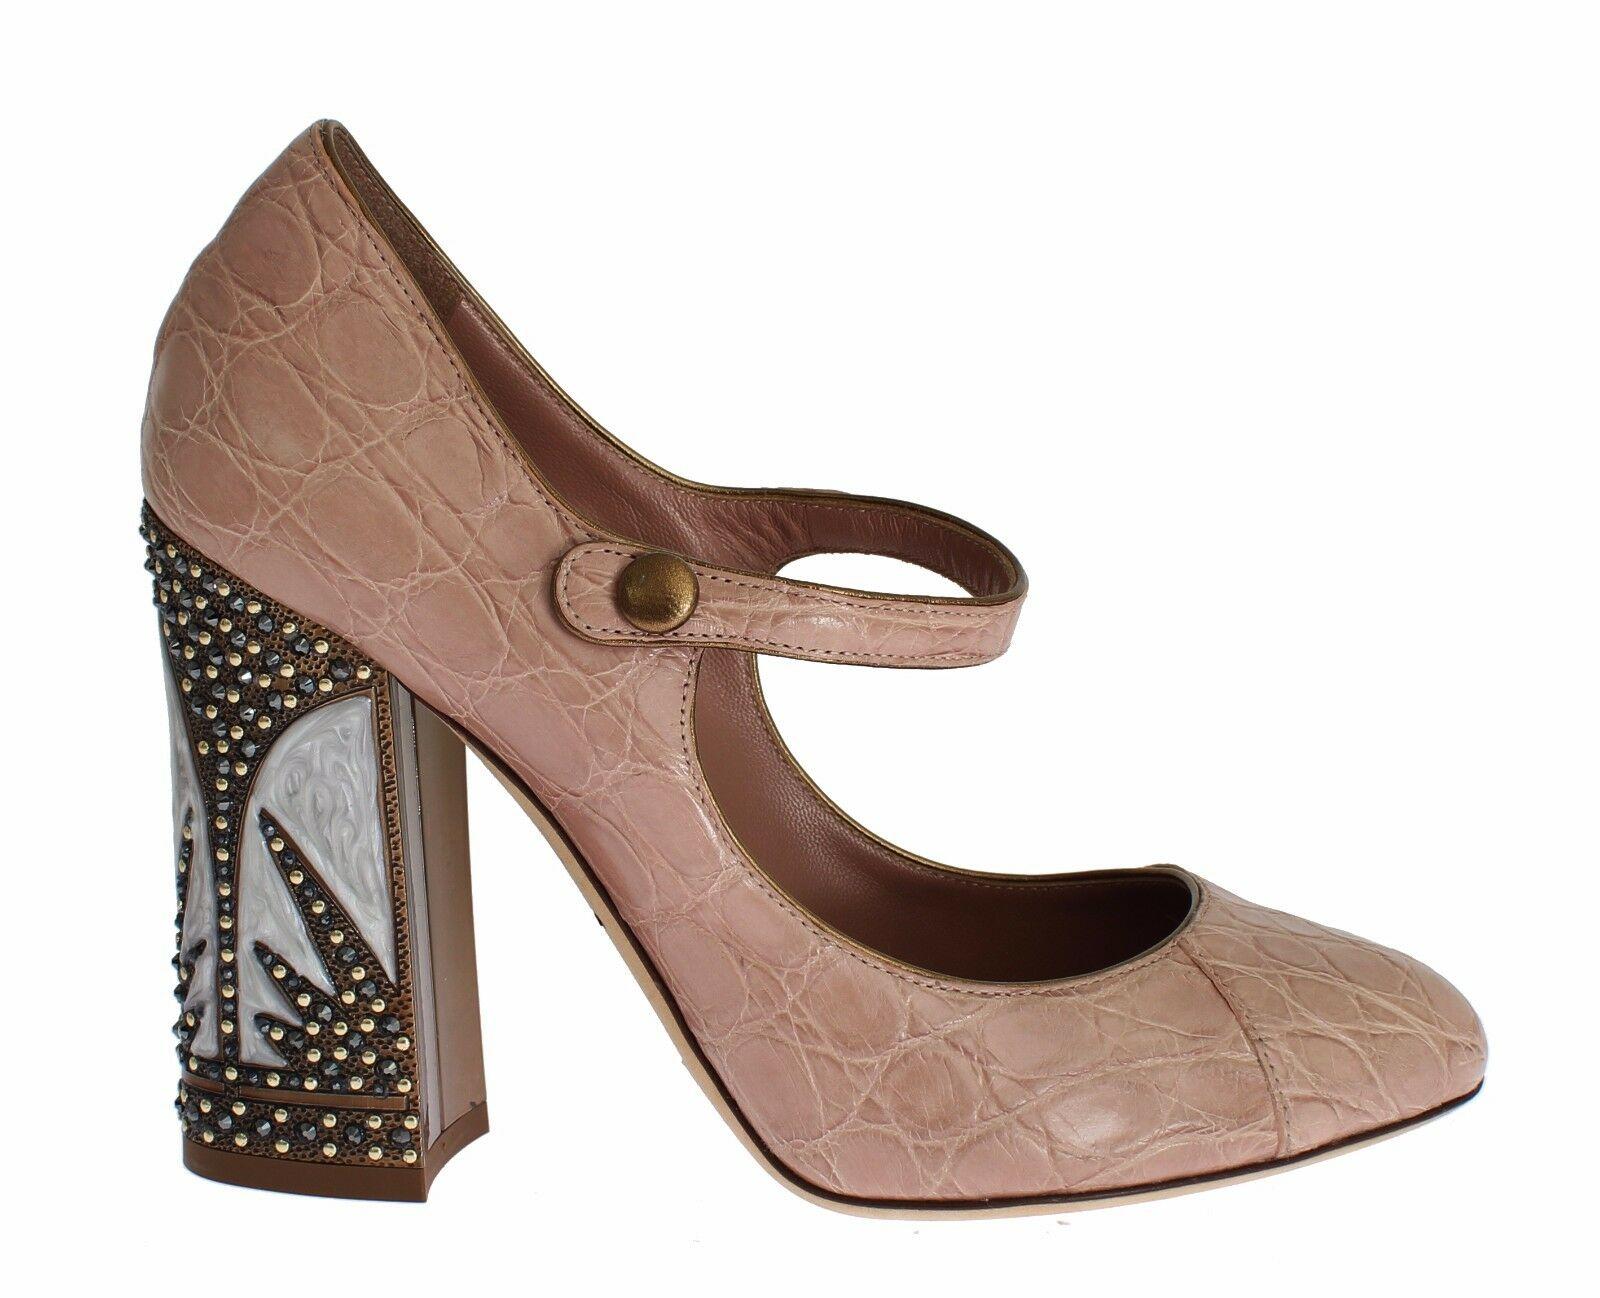 Dolce & Gabbana Women's Leather Embellished Heel Pink LA2174 - EU37/US6.5